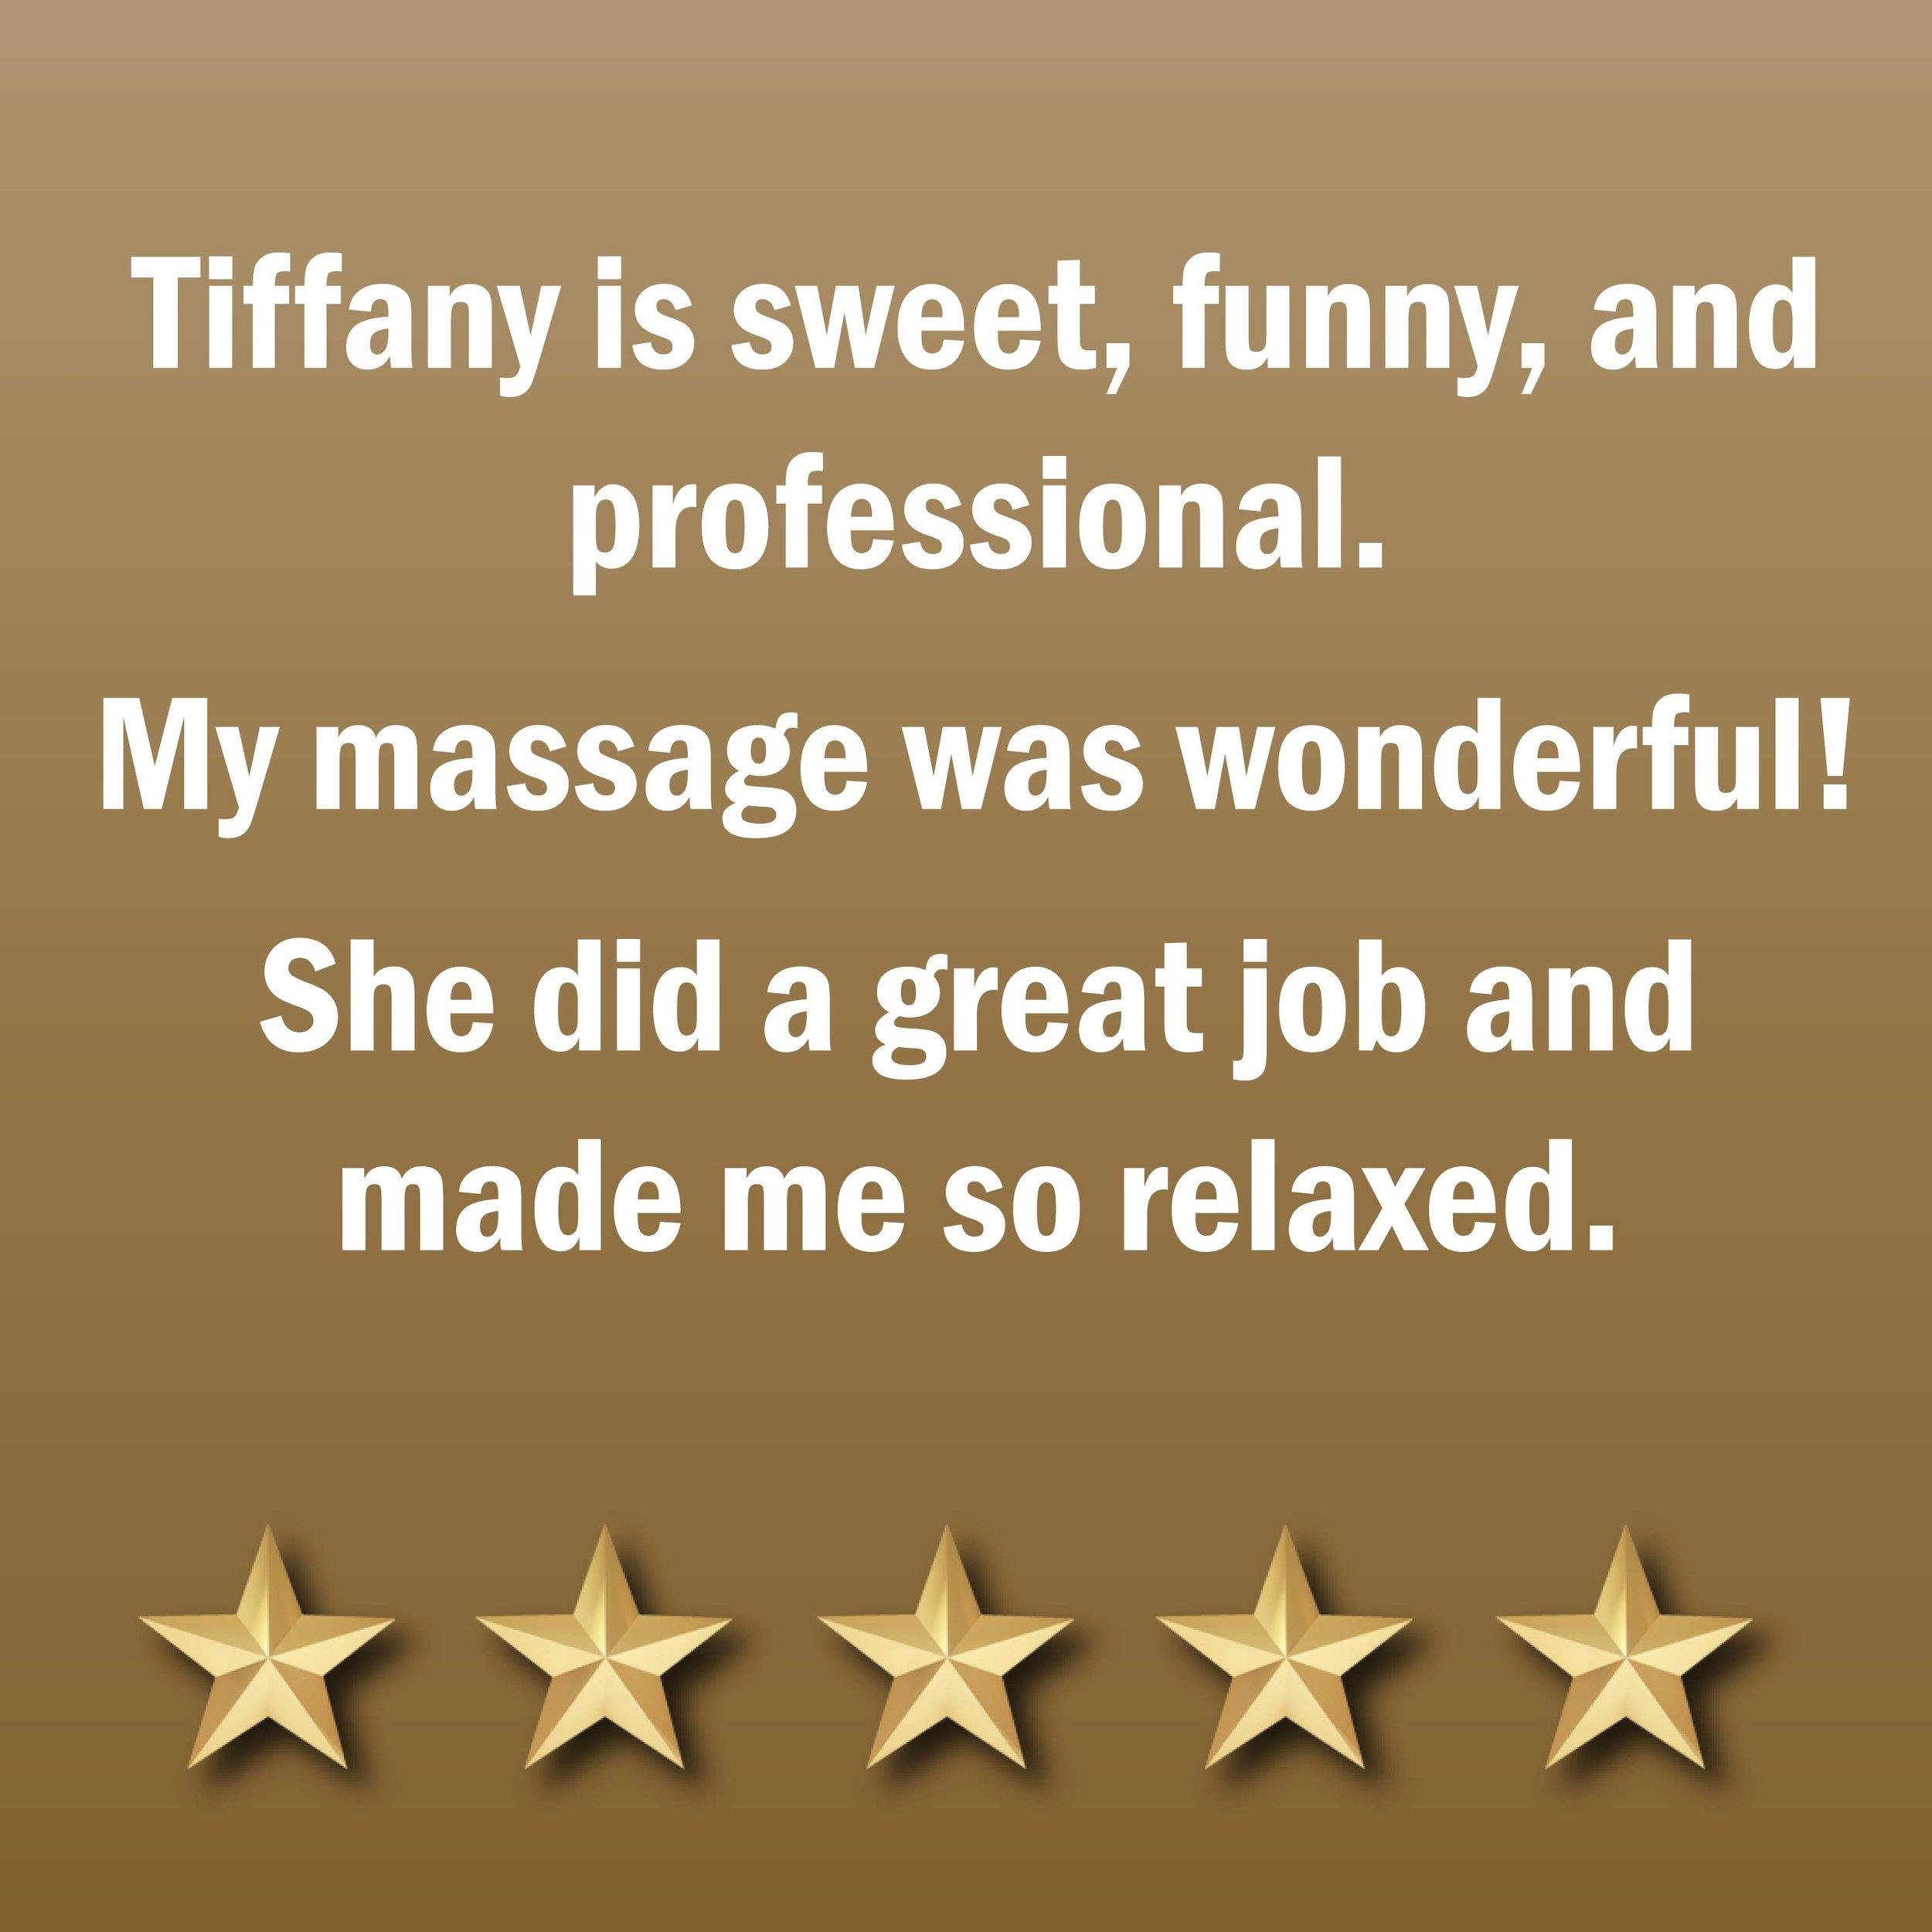 Tiffany1-01.jpg